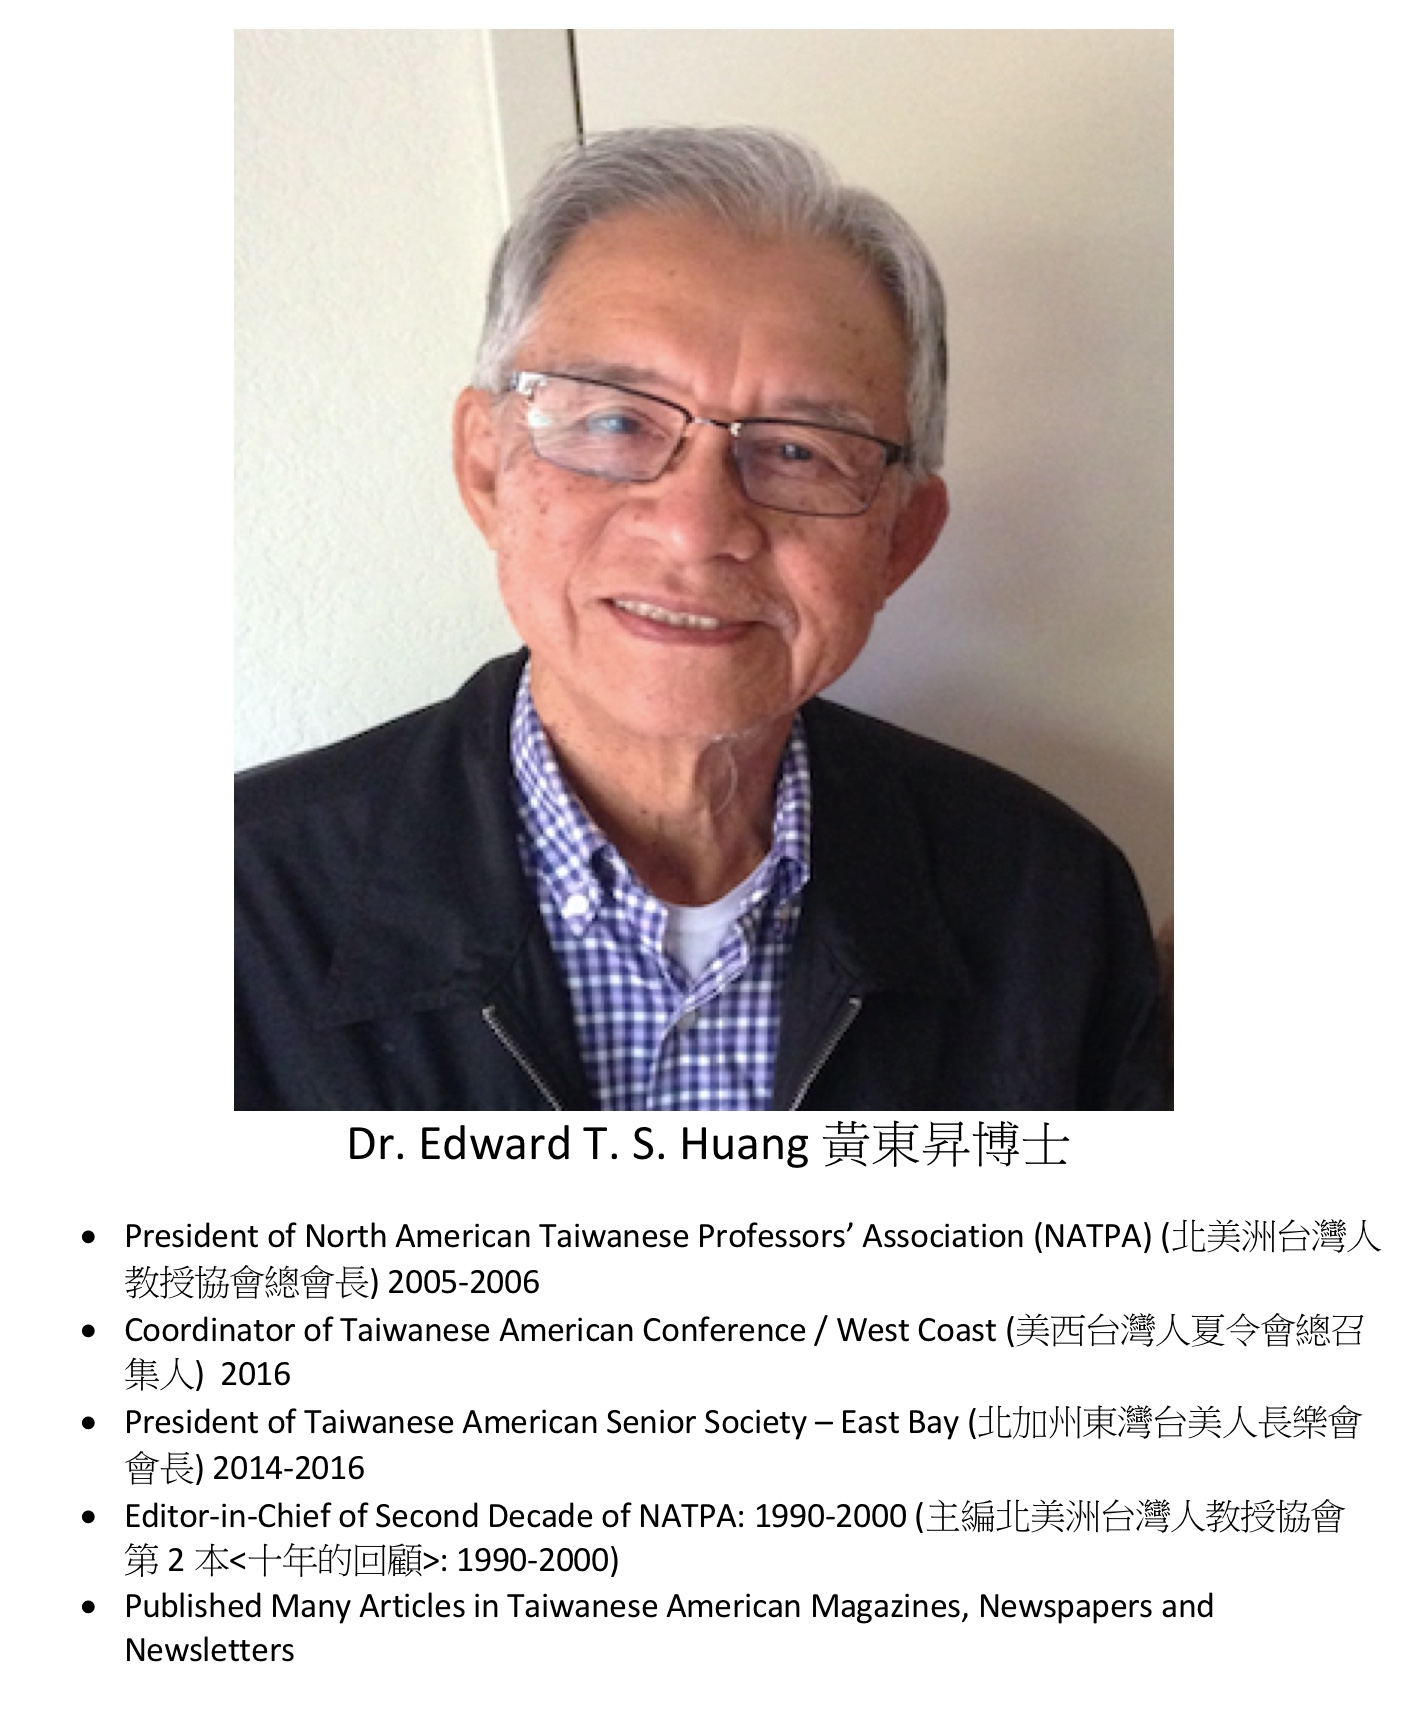 56. Dr. Edward T. S. Huang 黃東昇博士